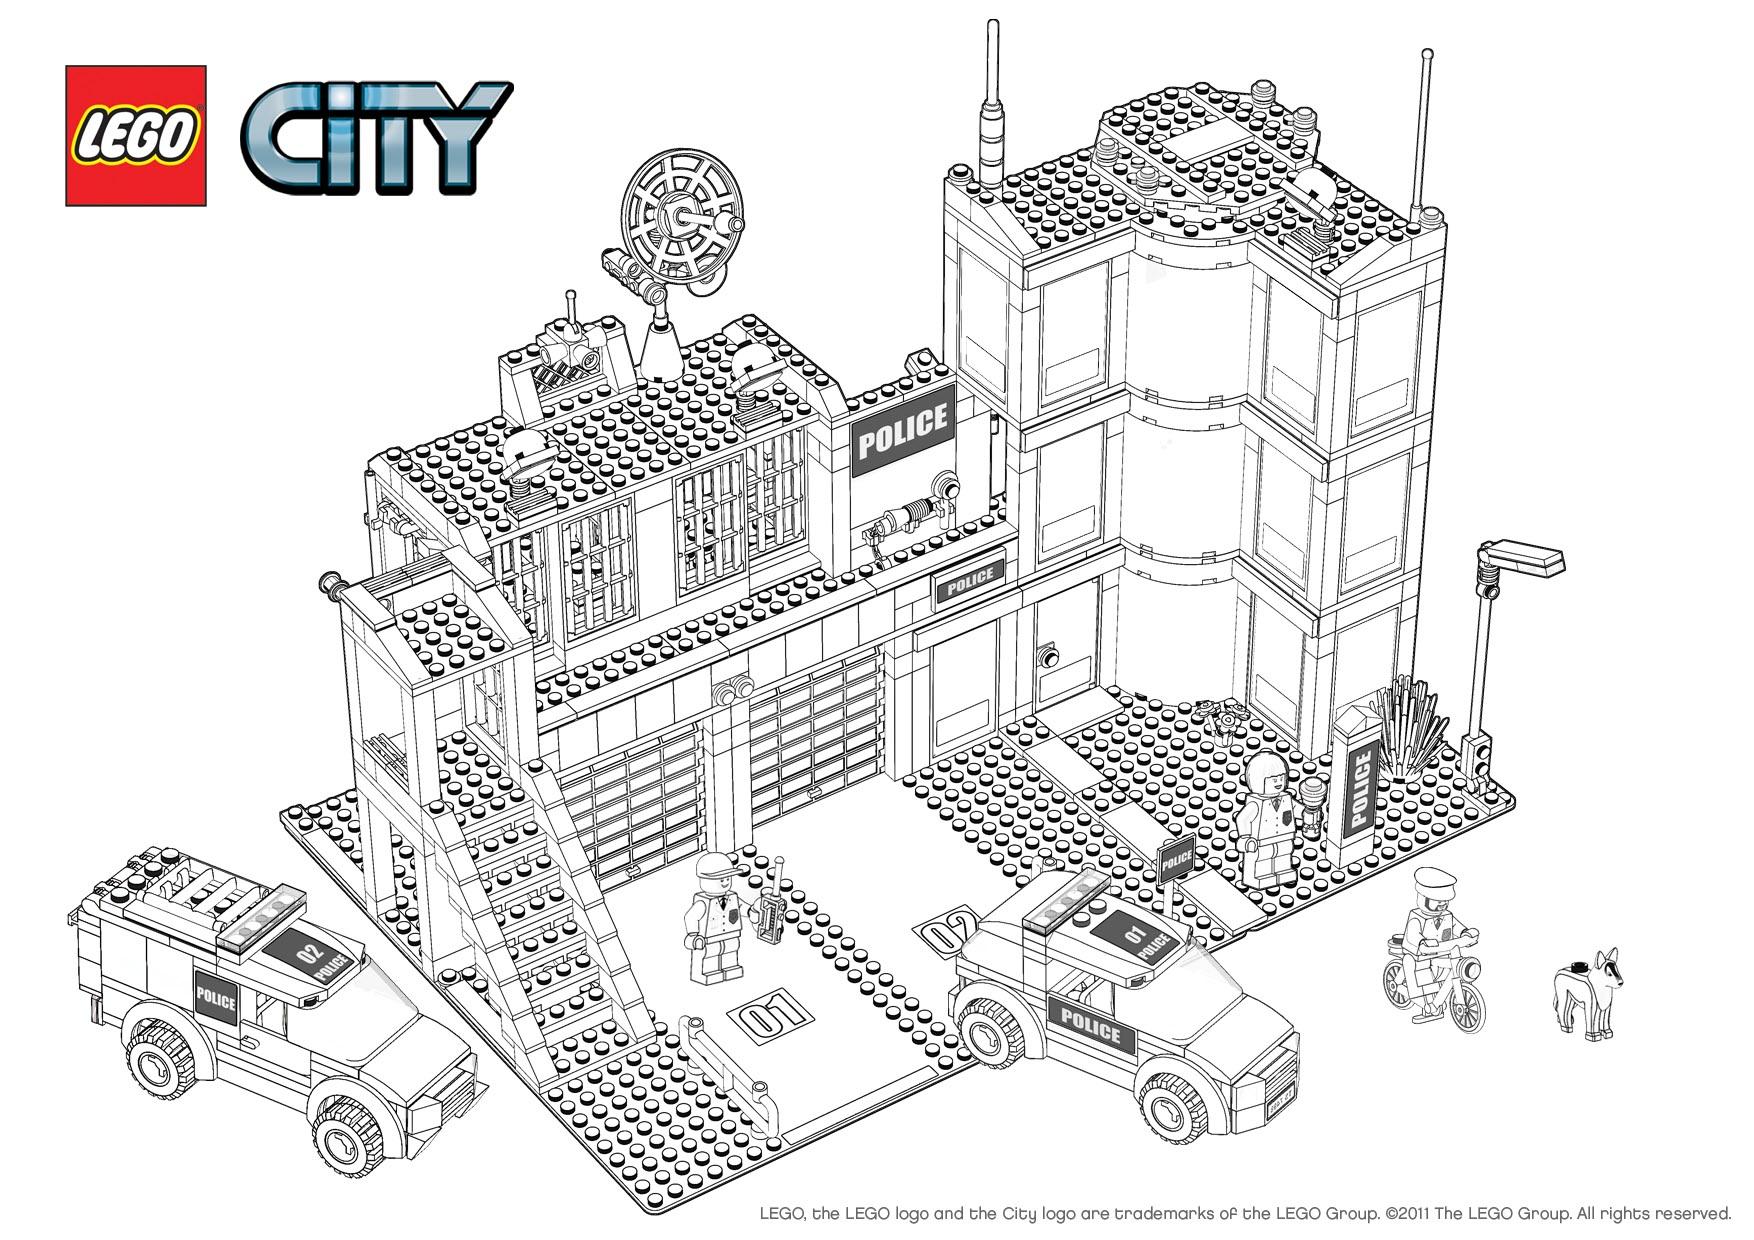 dessin lego city à imprimer